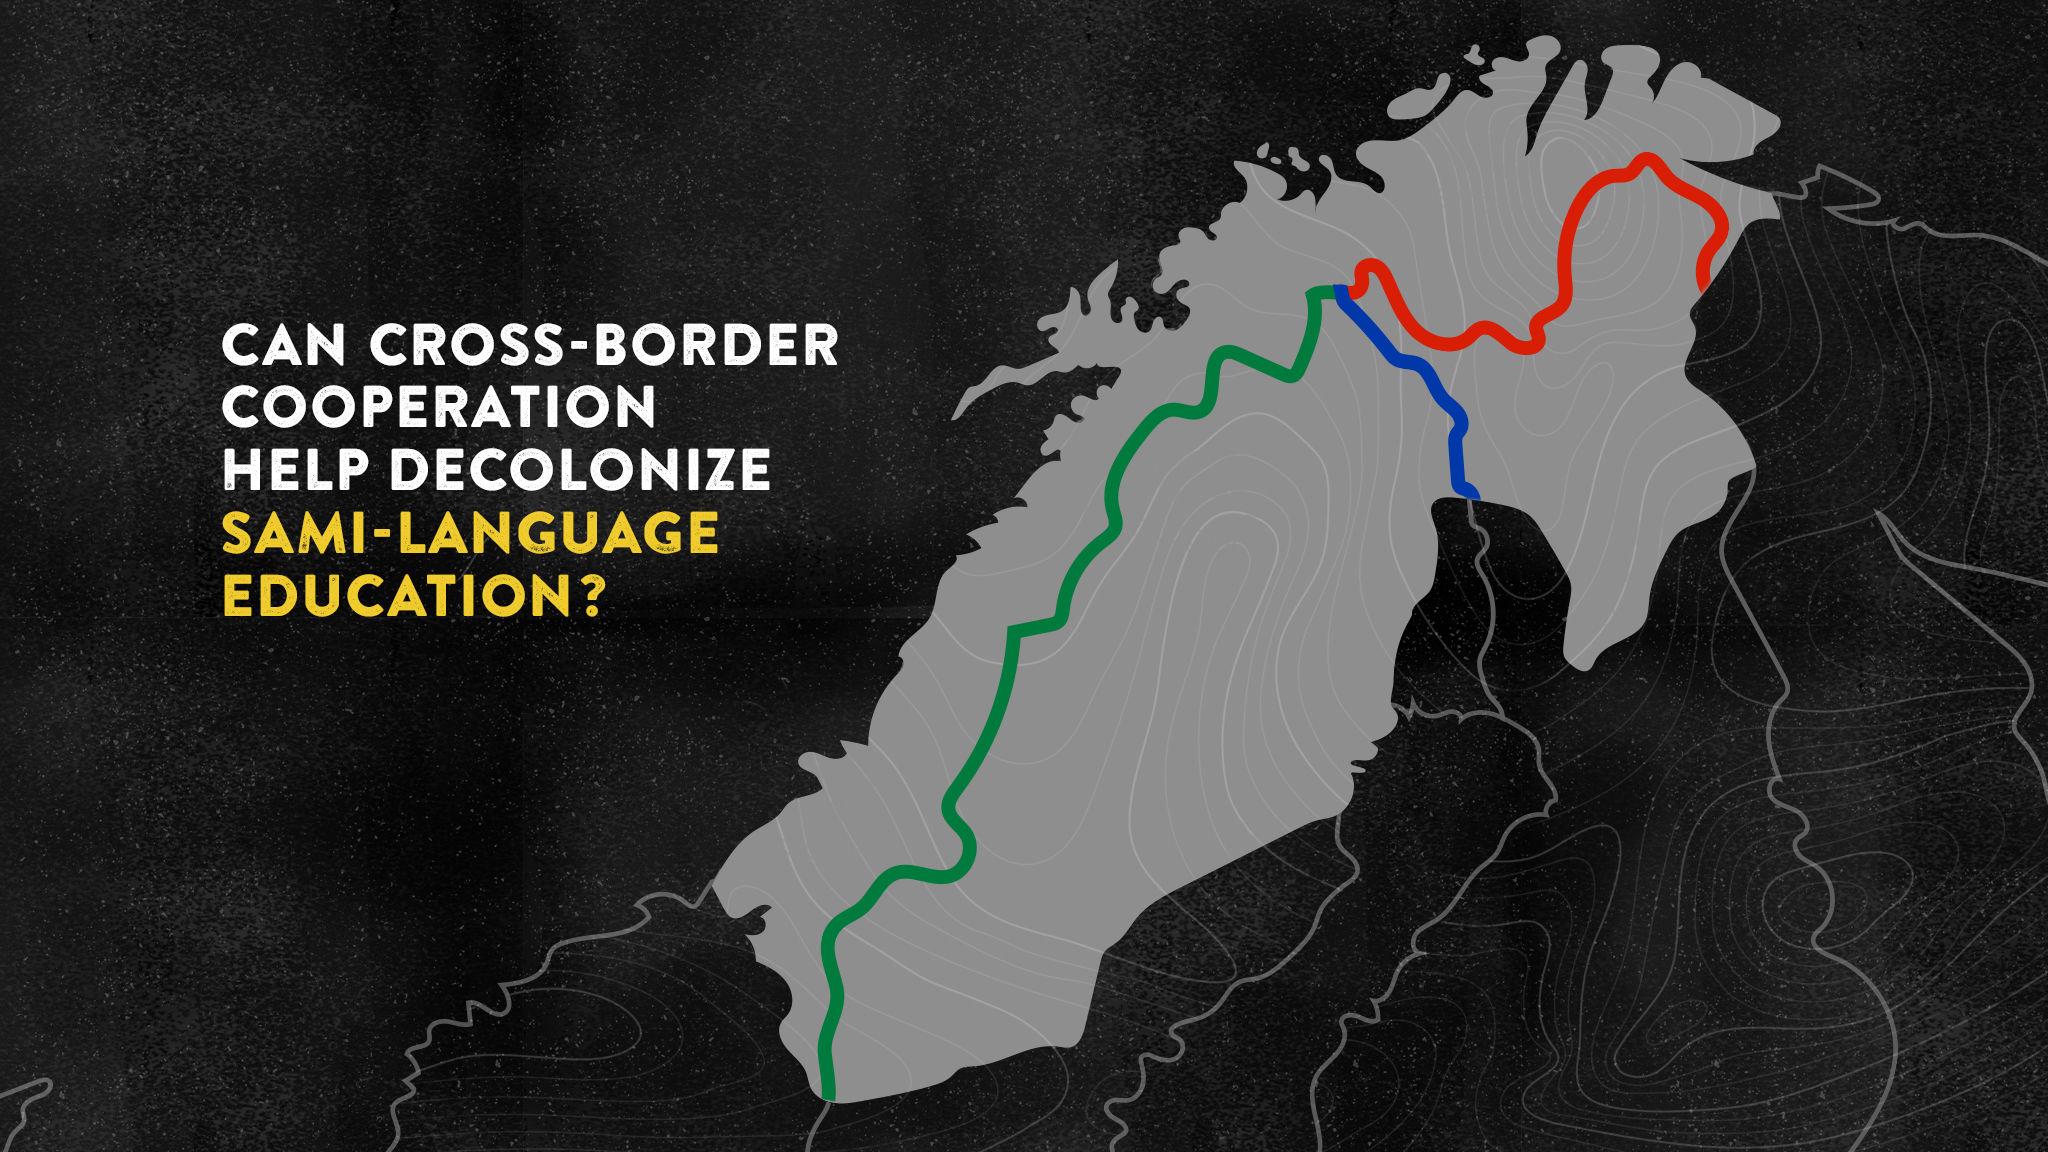 Can cross-border cooperation help decolonize Sami-language education?